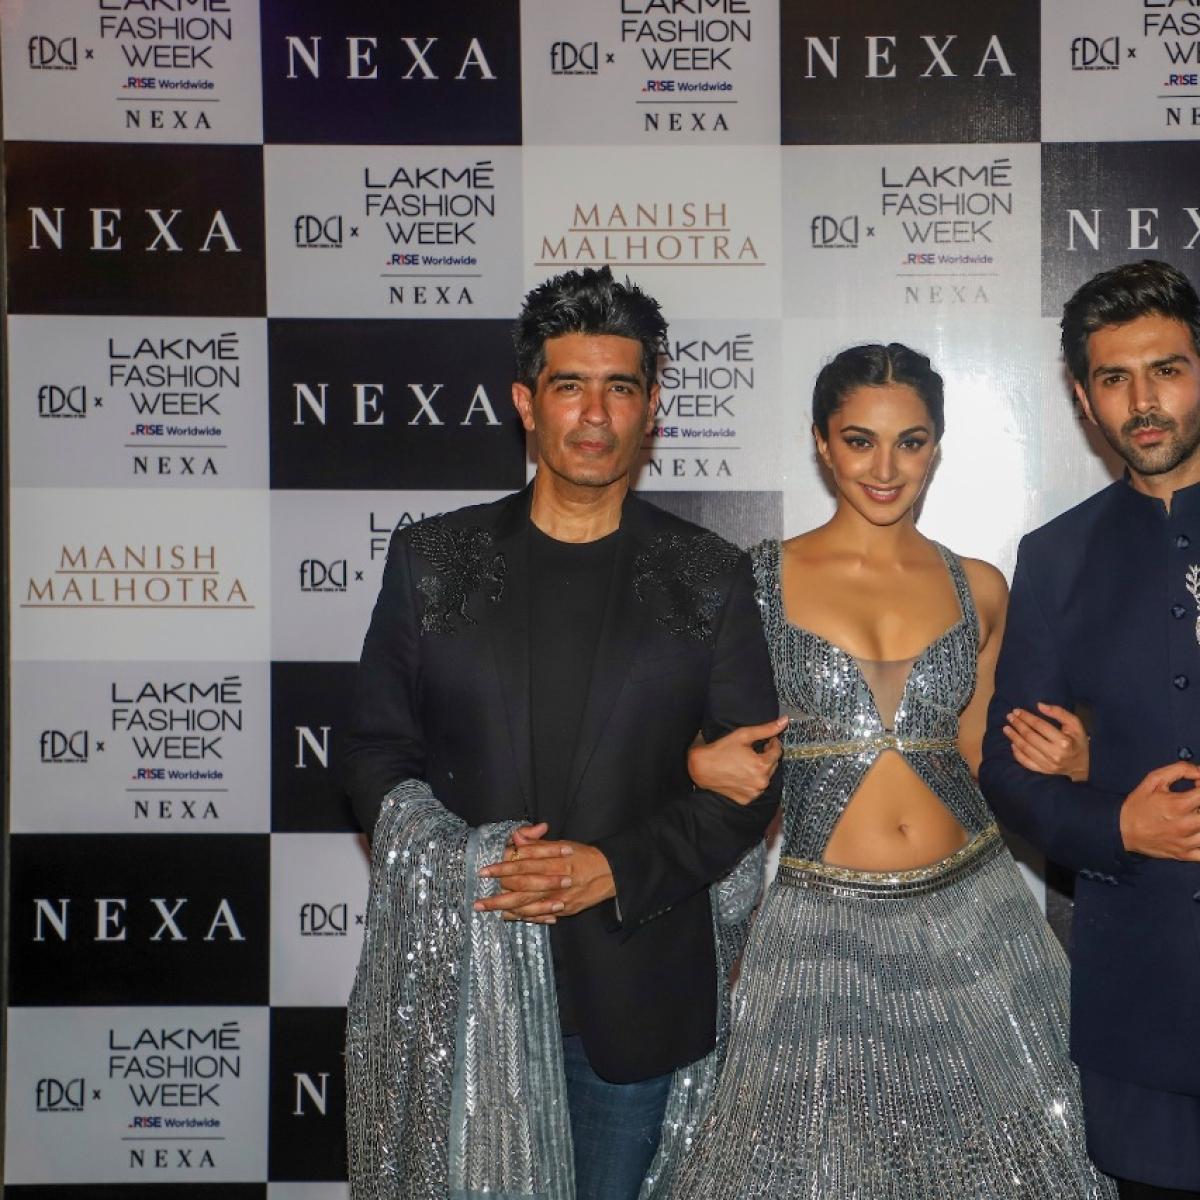 FDCI x Lakme Fashion Week 2021: 'Bhool Bhulaiyaa 2' stars Kartik Aaryan, Kiara Advani turn showstoppers for Manish Malhotra